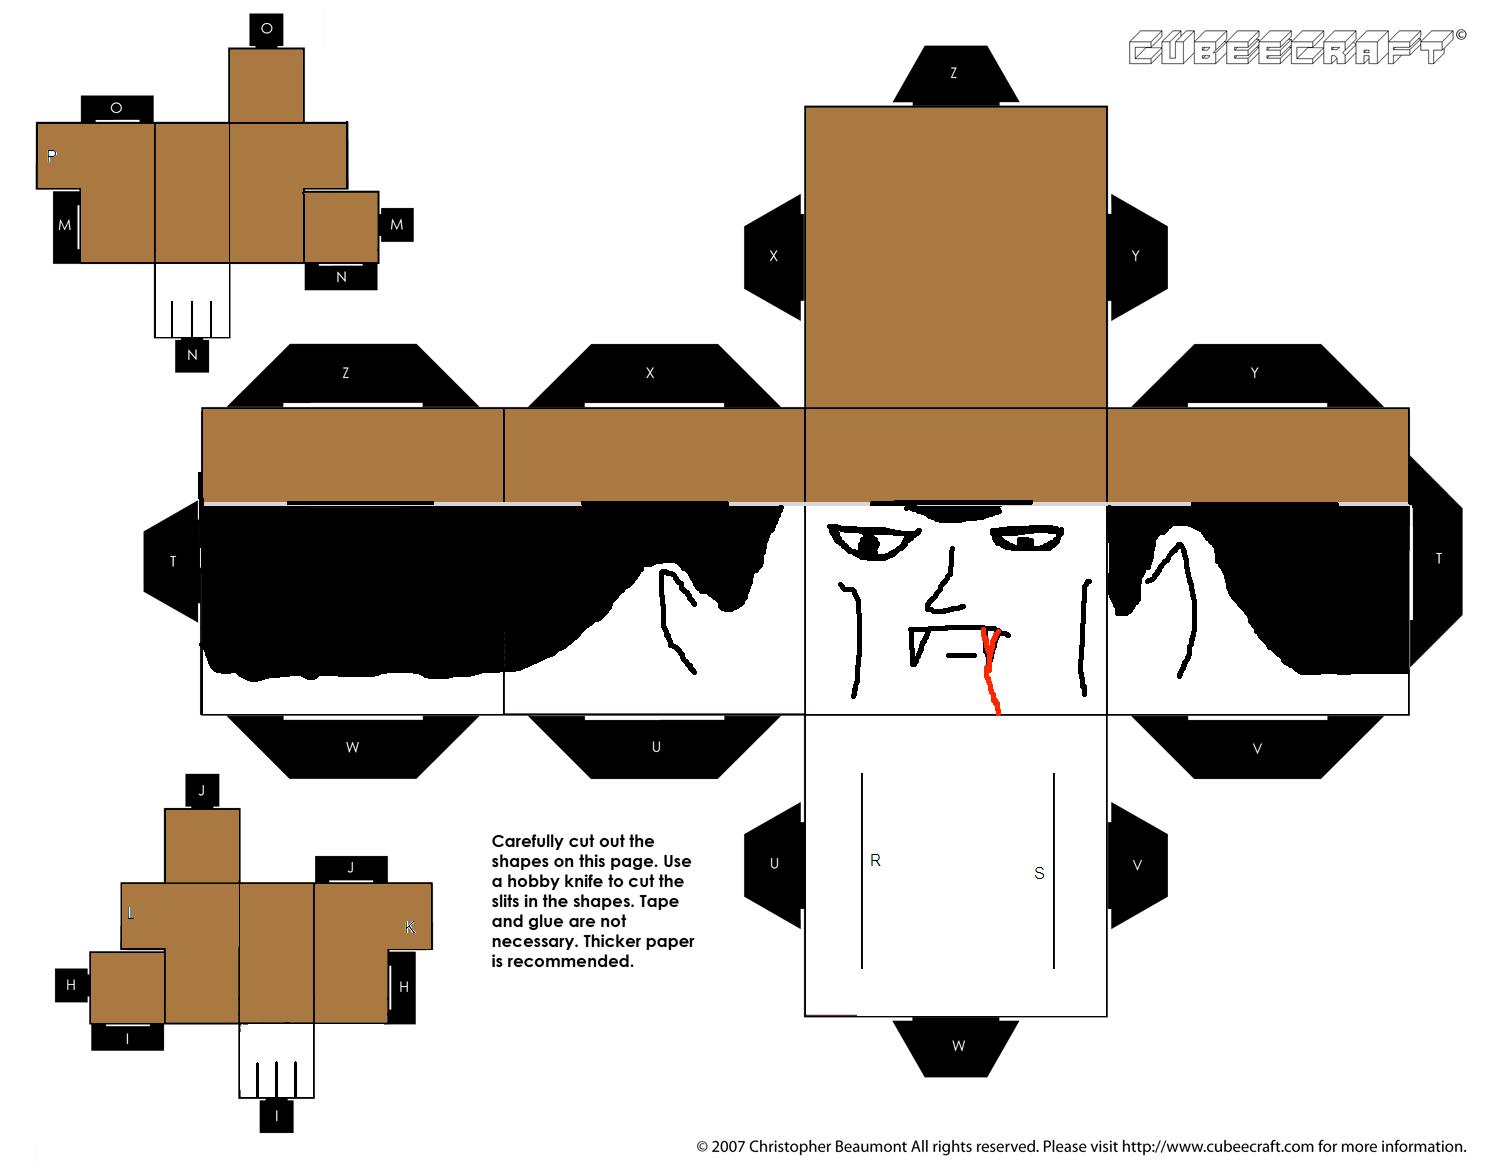 Count Dracula Cubeecraft By Bobtheegg On Deviantart